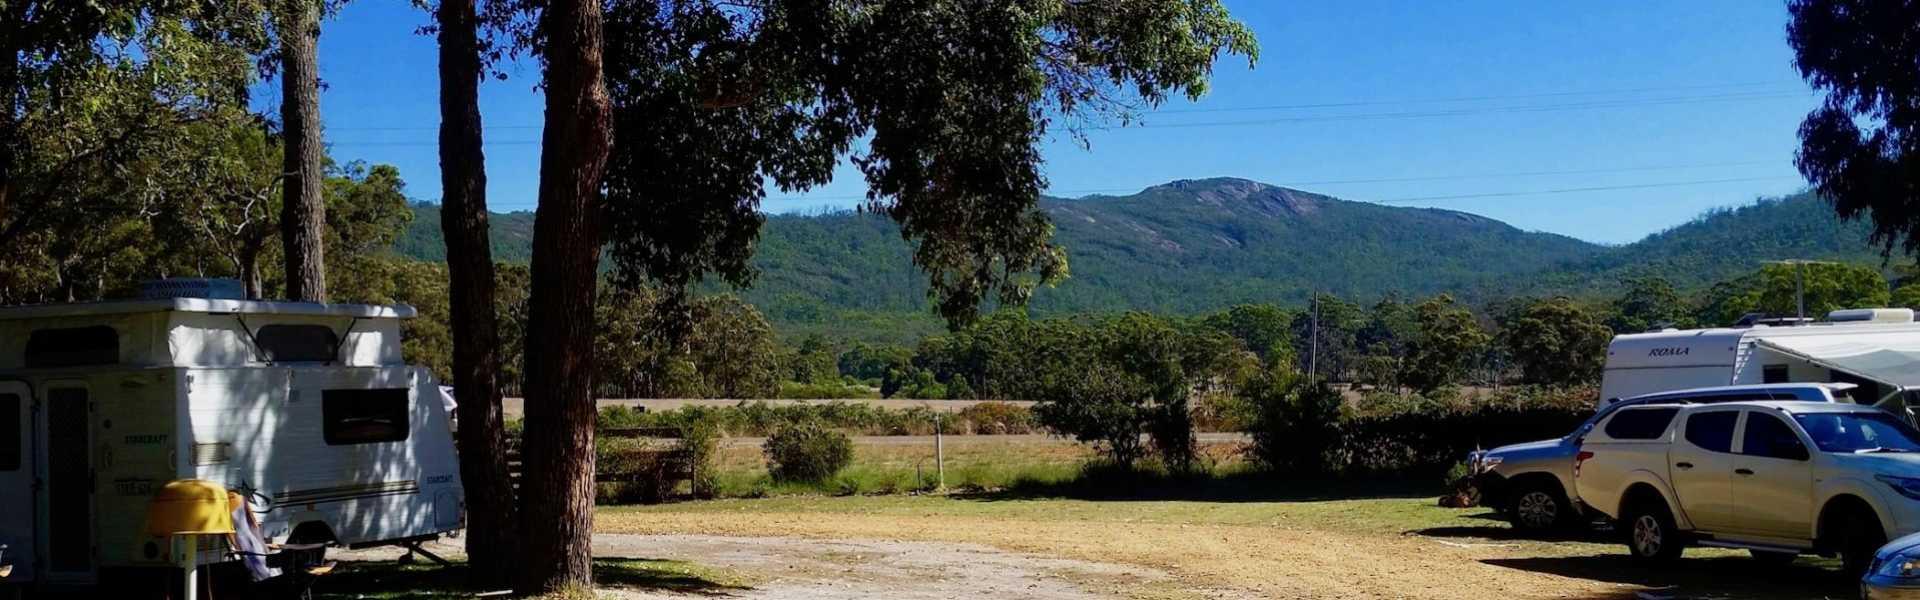 Kui Parks, Porongurup Range Tourist Park, Range